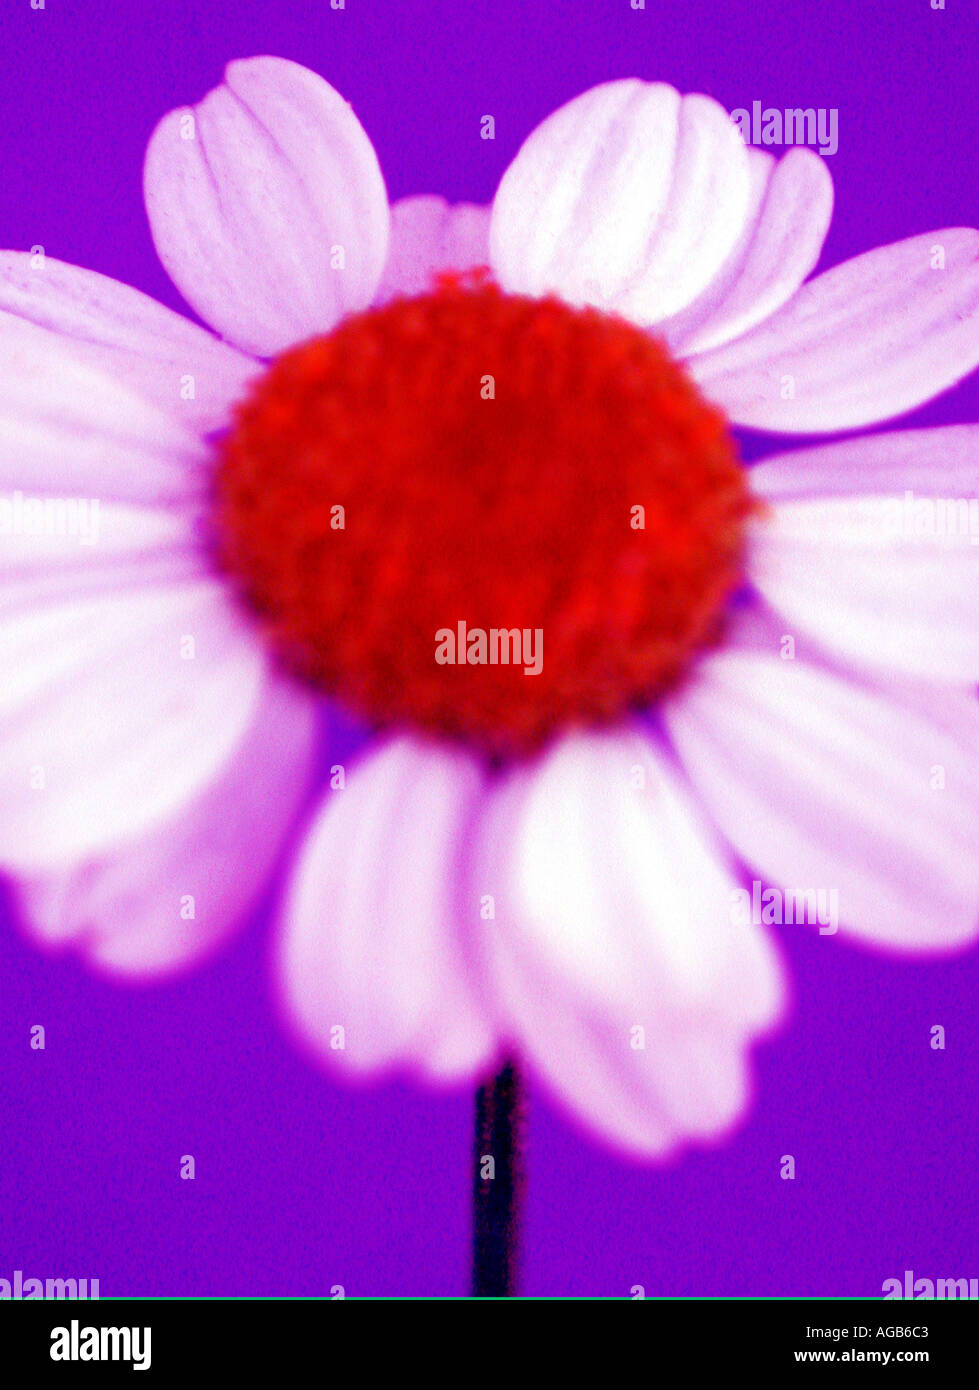 Colour enhanced singular daisy flower - Stock Image